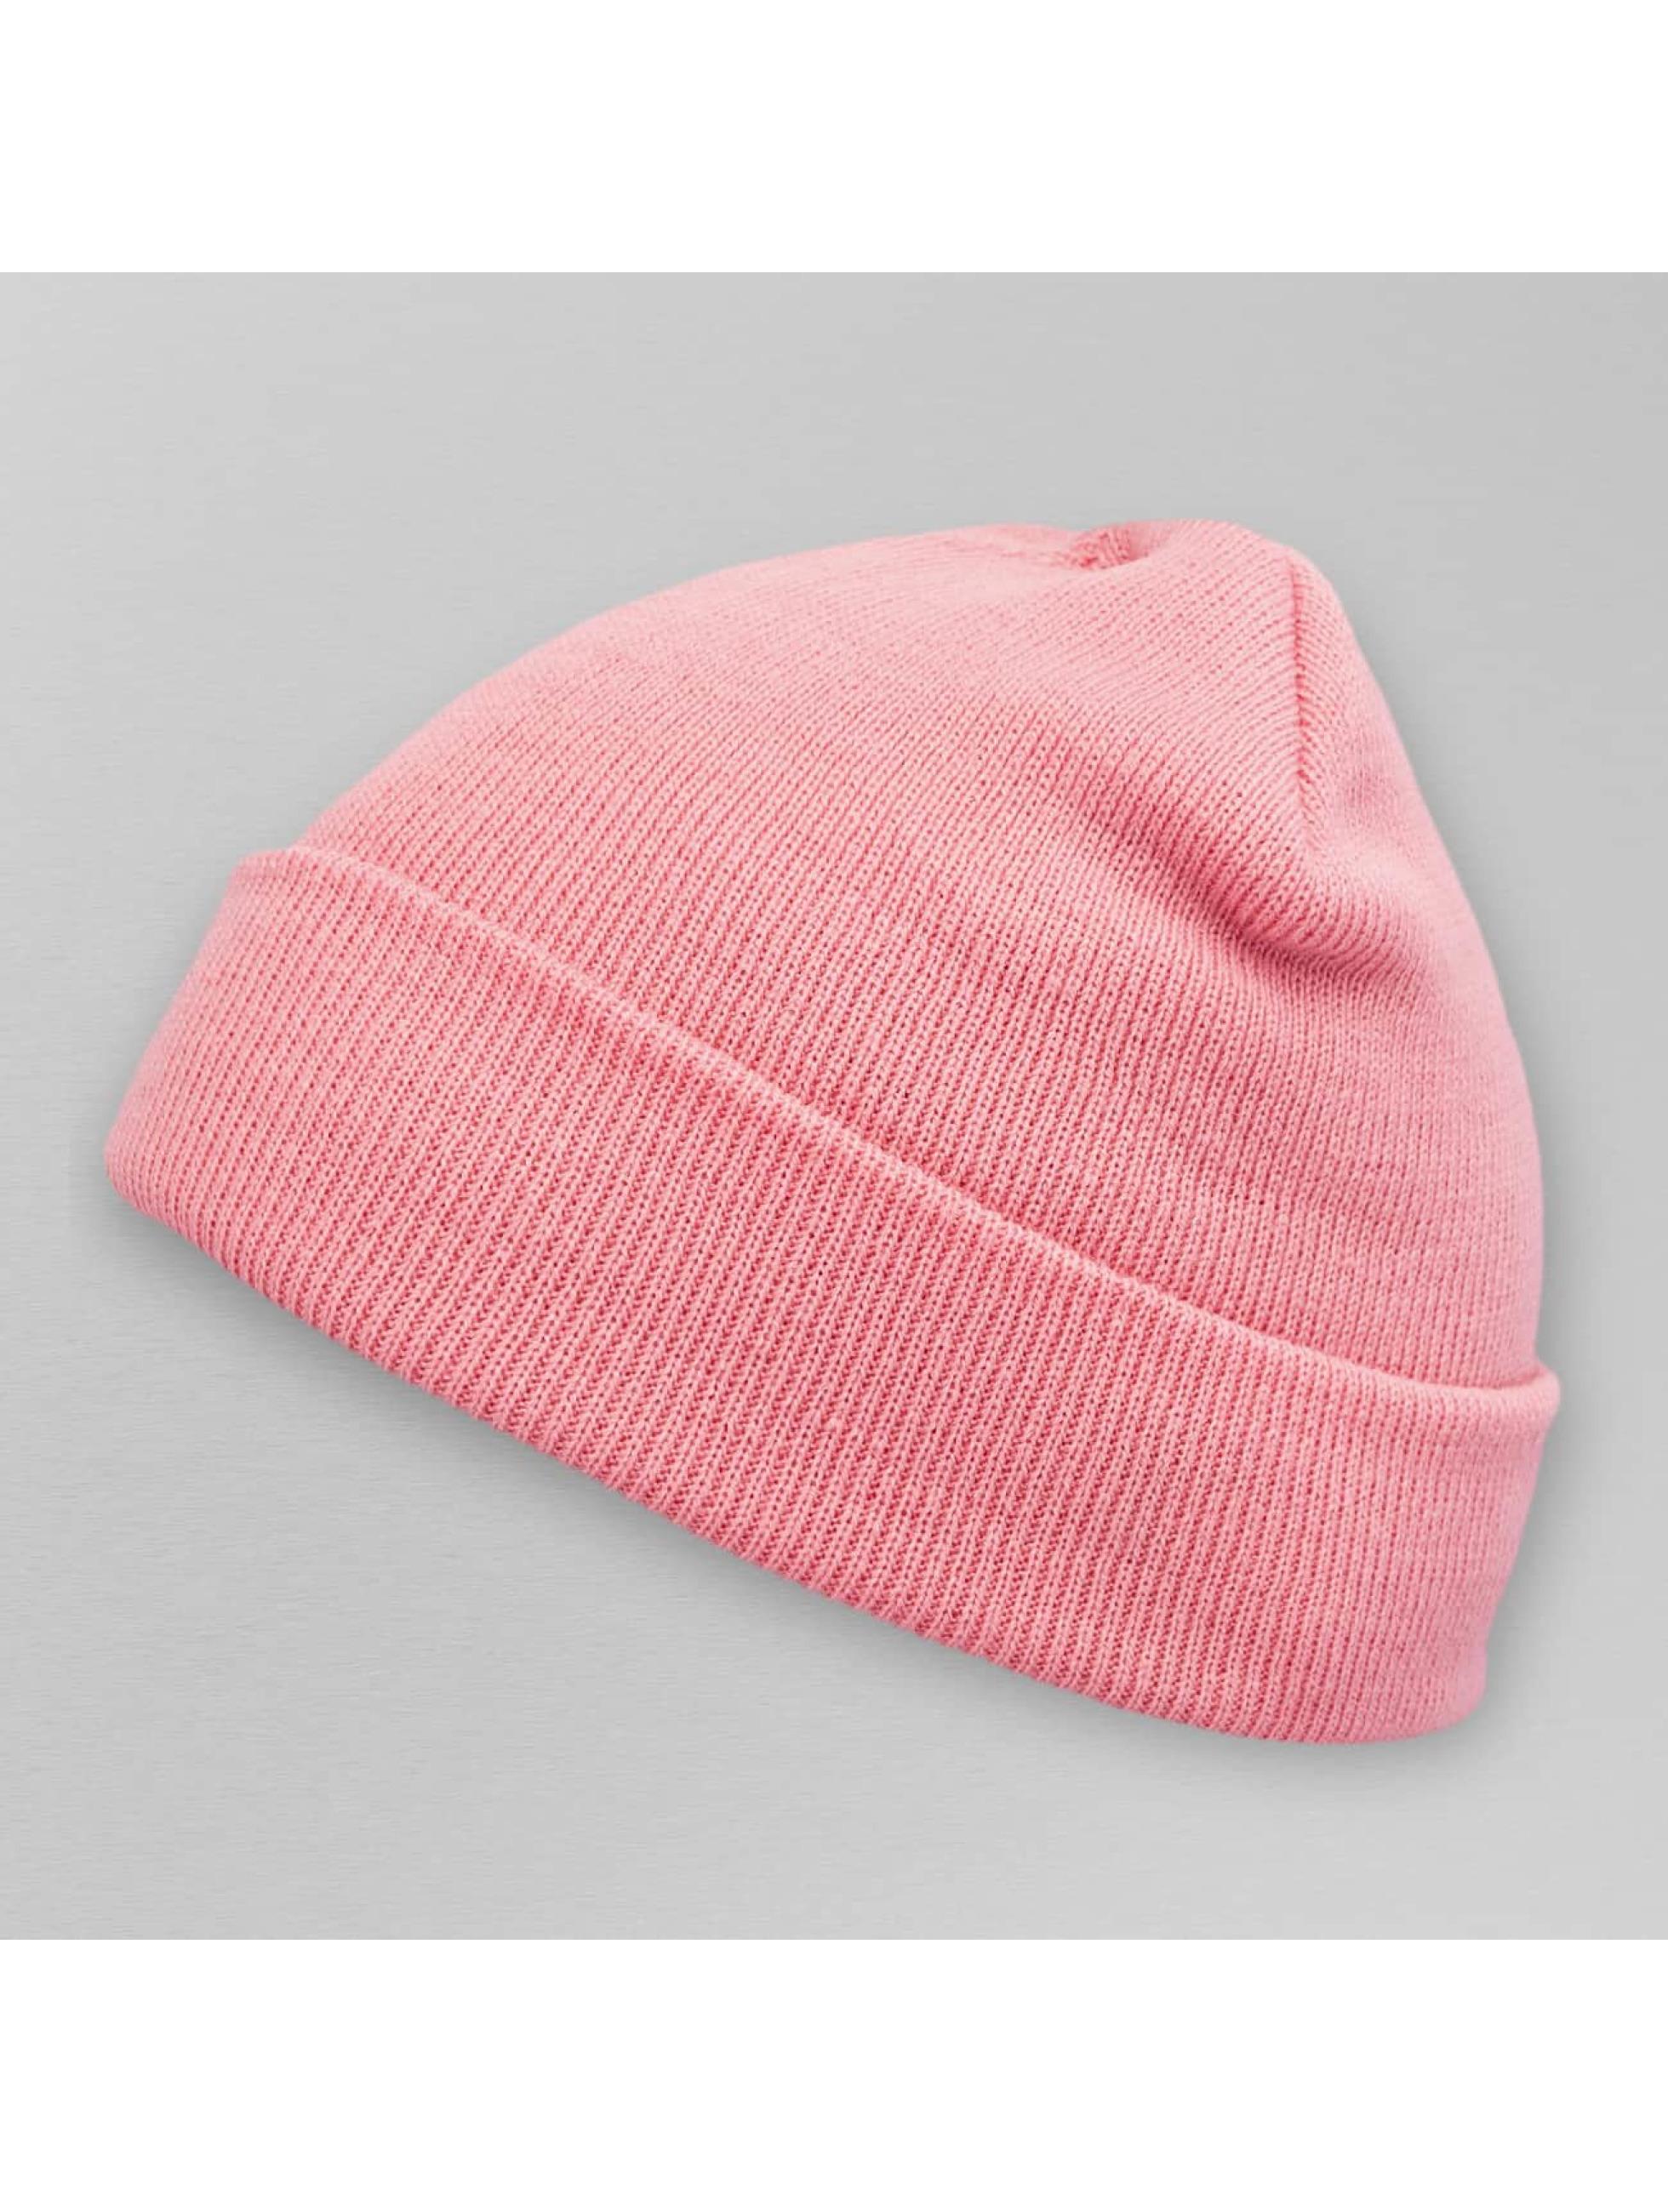 MSTRDS Männer,Frauen Beanie Pastel Basic Flap in rosa